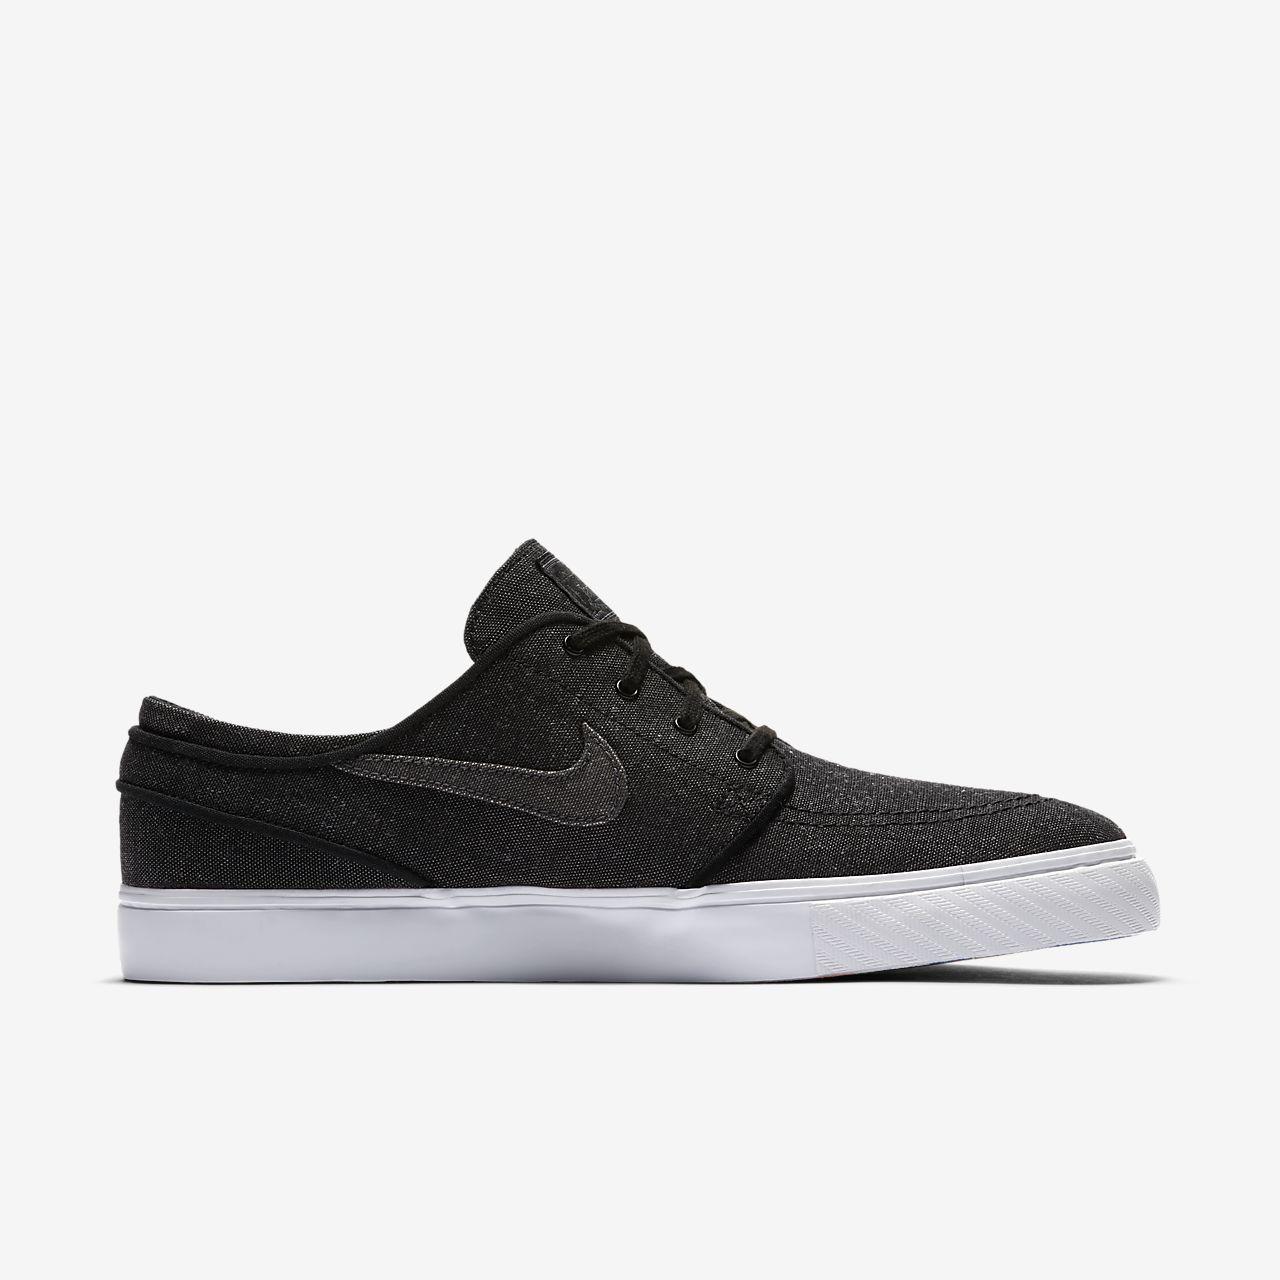 Nike Zoom Stefan Janoski L, Chaussures de Skate Homme, Noir (Black/Black-Black-Anthracite), 46 EU